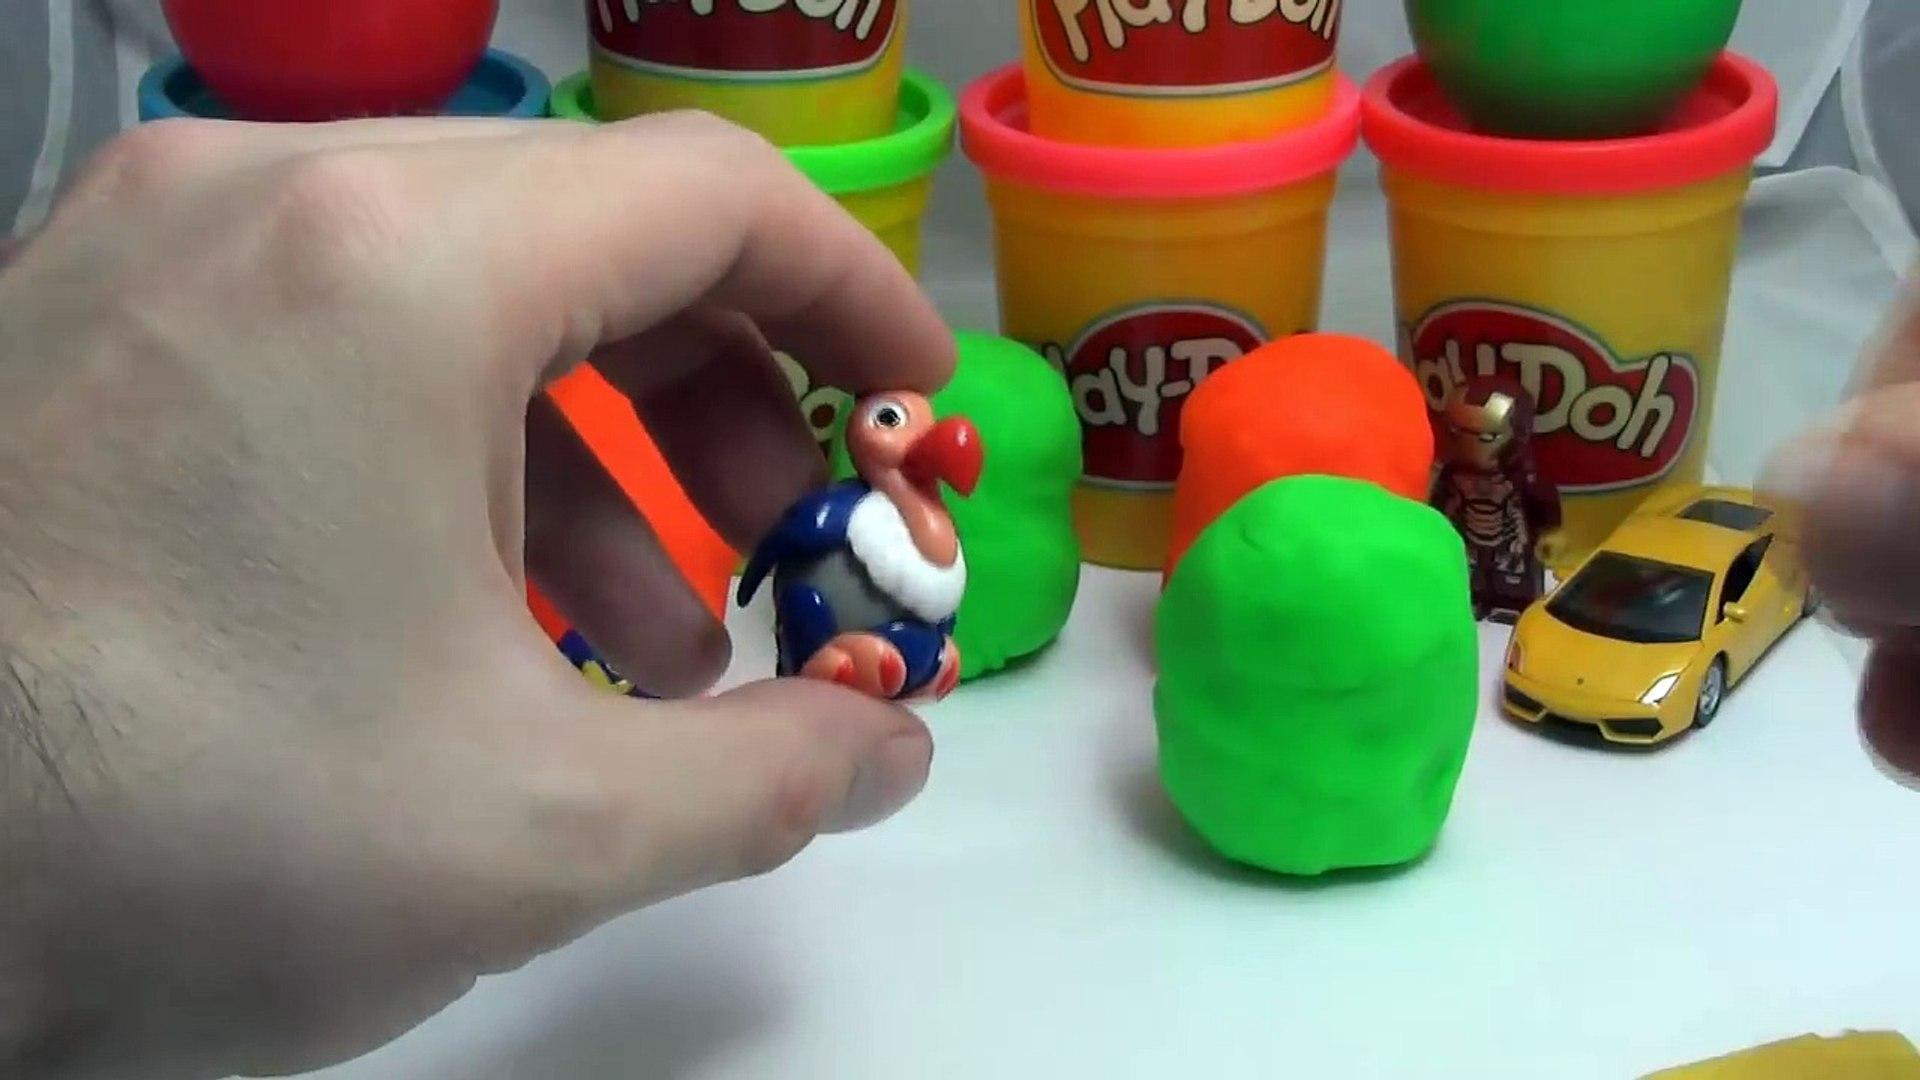 Коллекция Киндер сюрприз - игрушки из 90-х и пластилин Play-doh. Angry Birds 90-х [Видео д